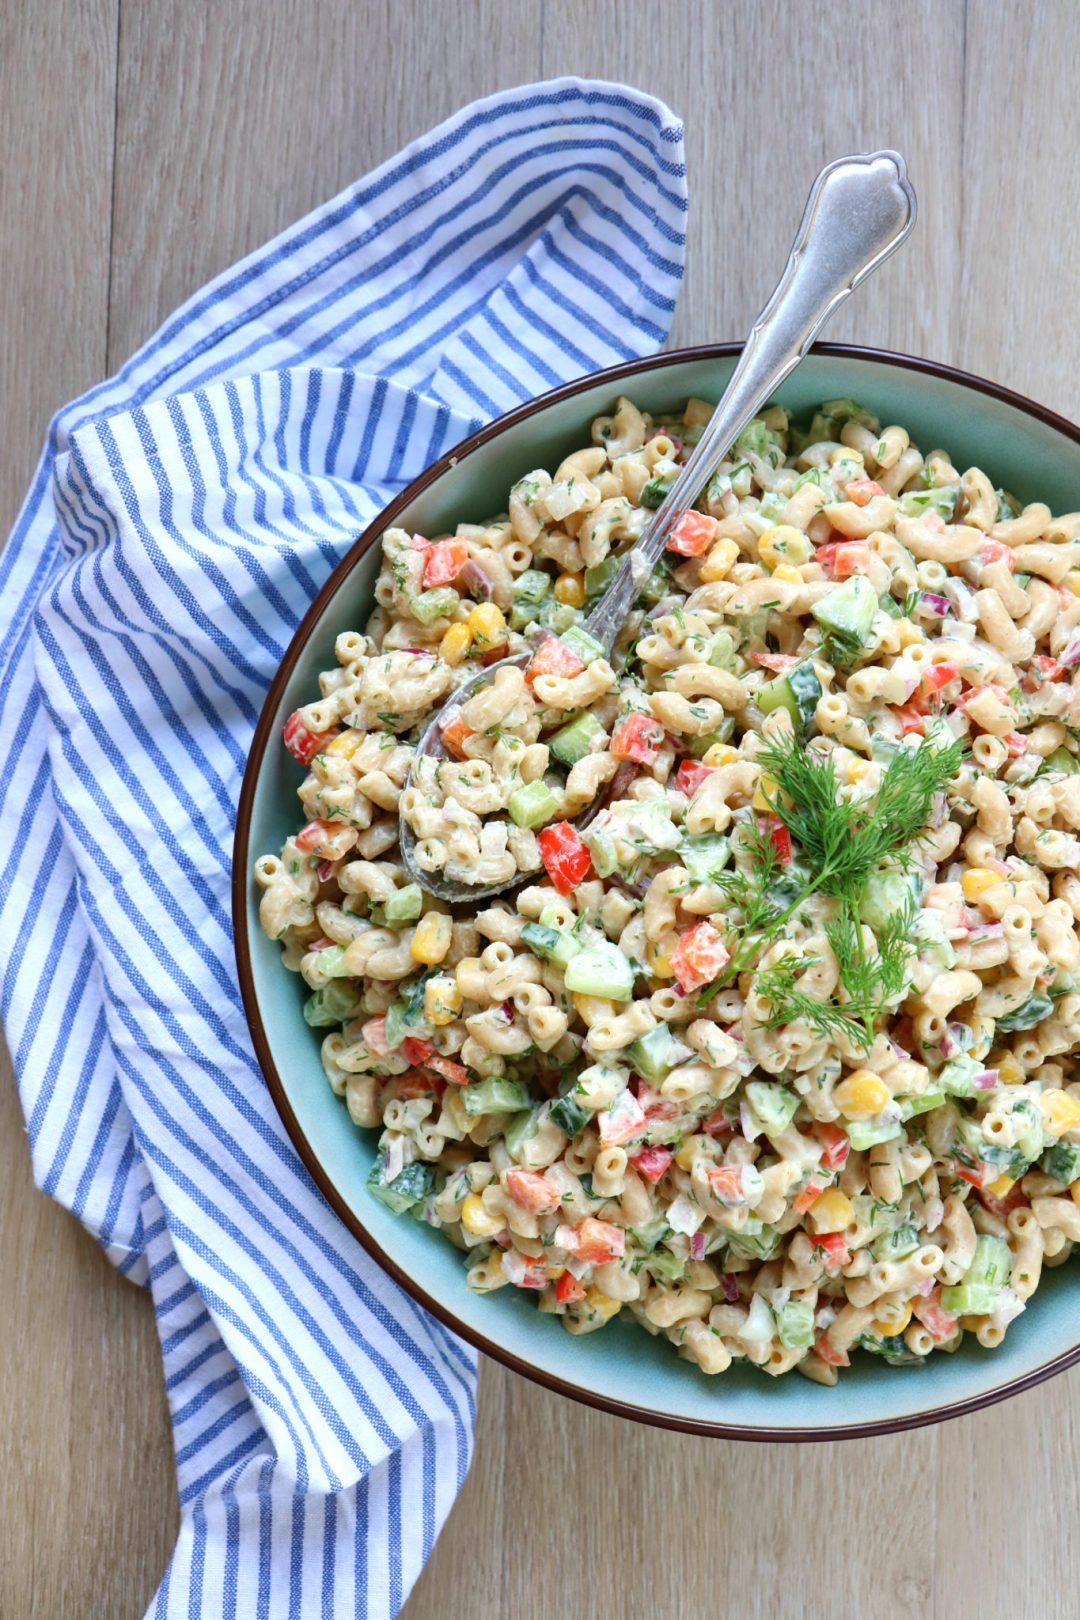 Recept macaroni pasta salade vega www.jaimyskitchen.nl